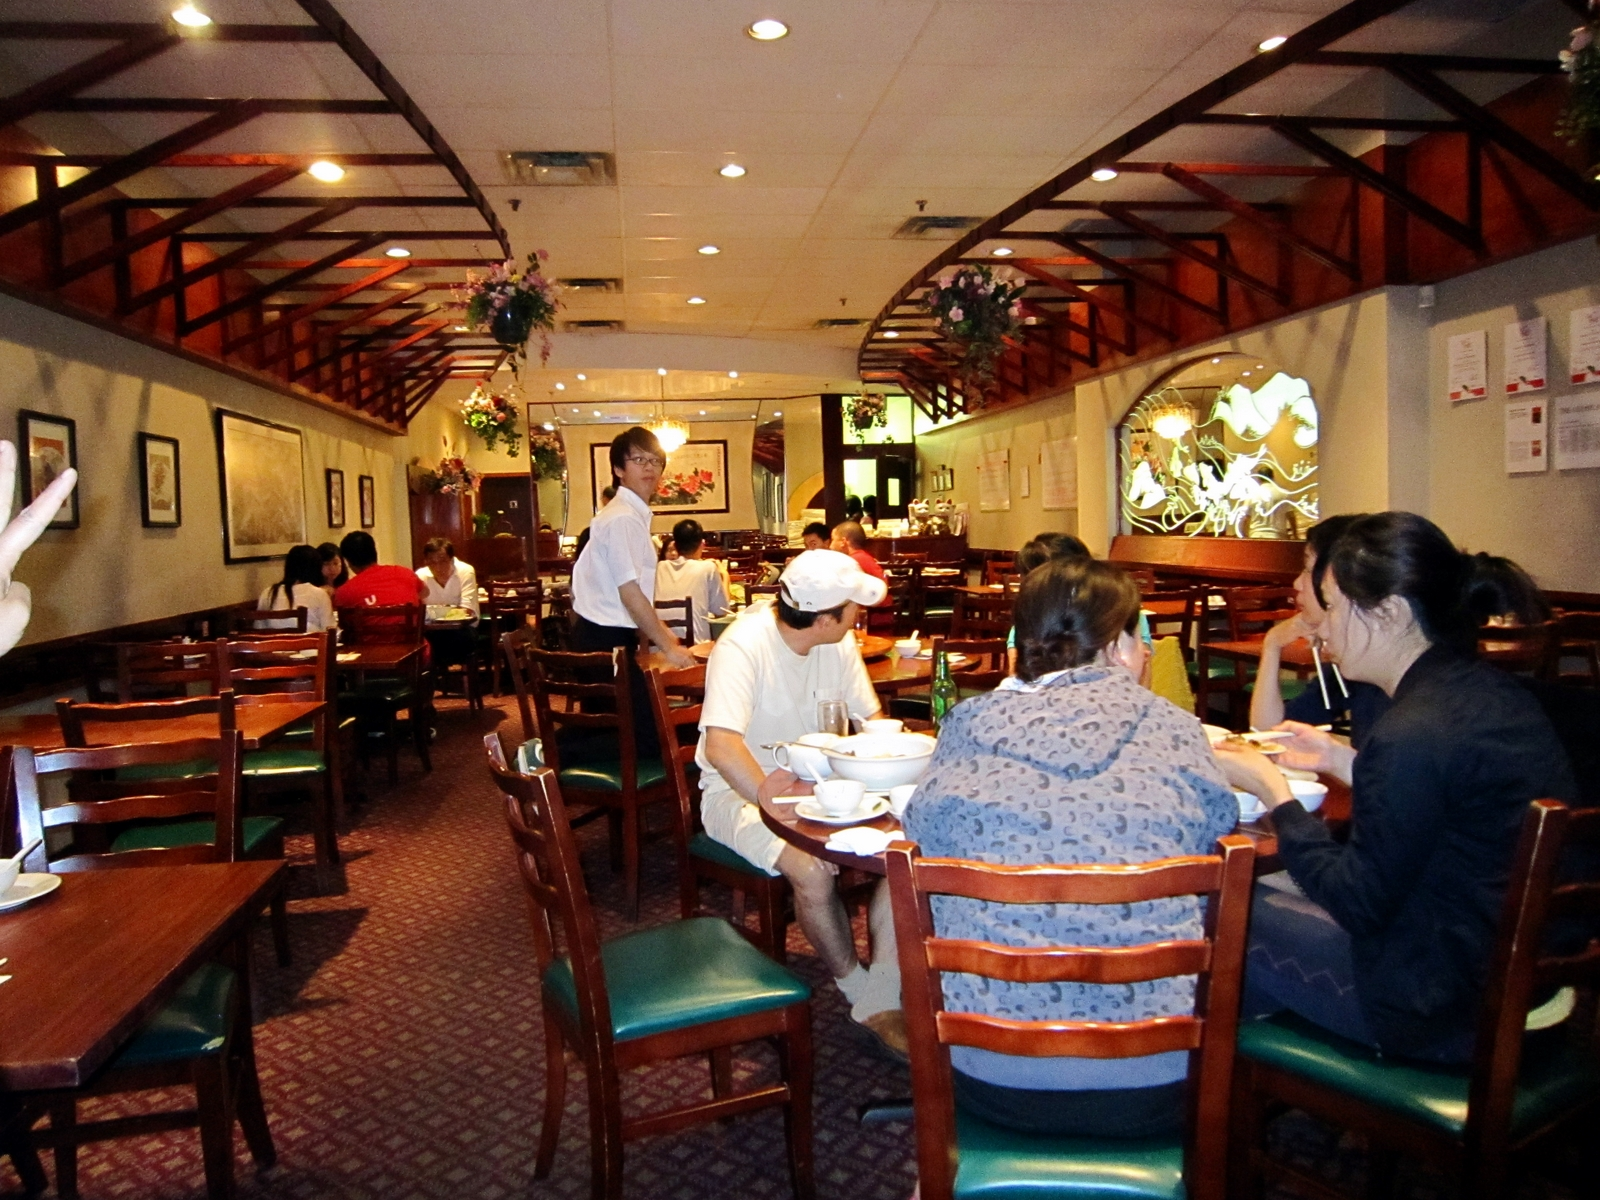 Chung King Garden :: Peking Duck Yum | Cookies and Tomatoes